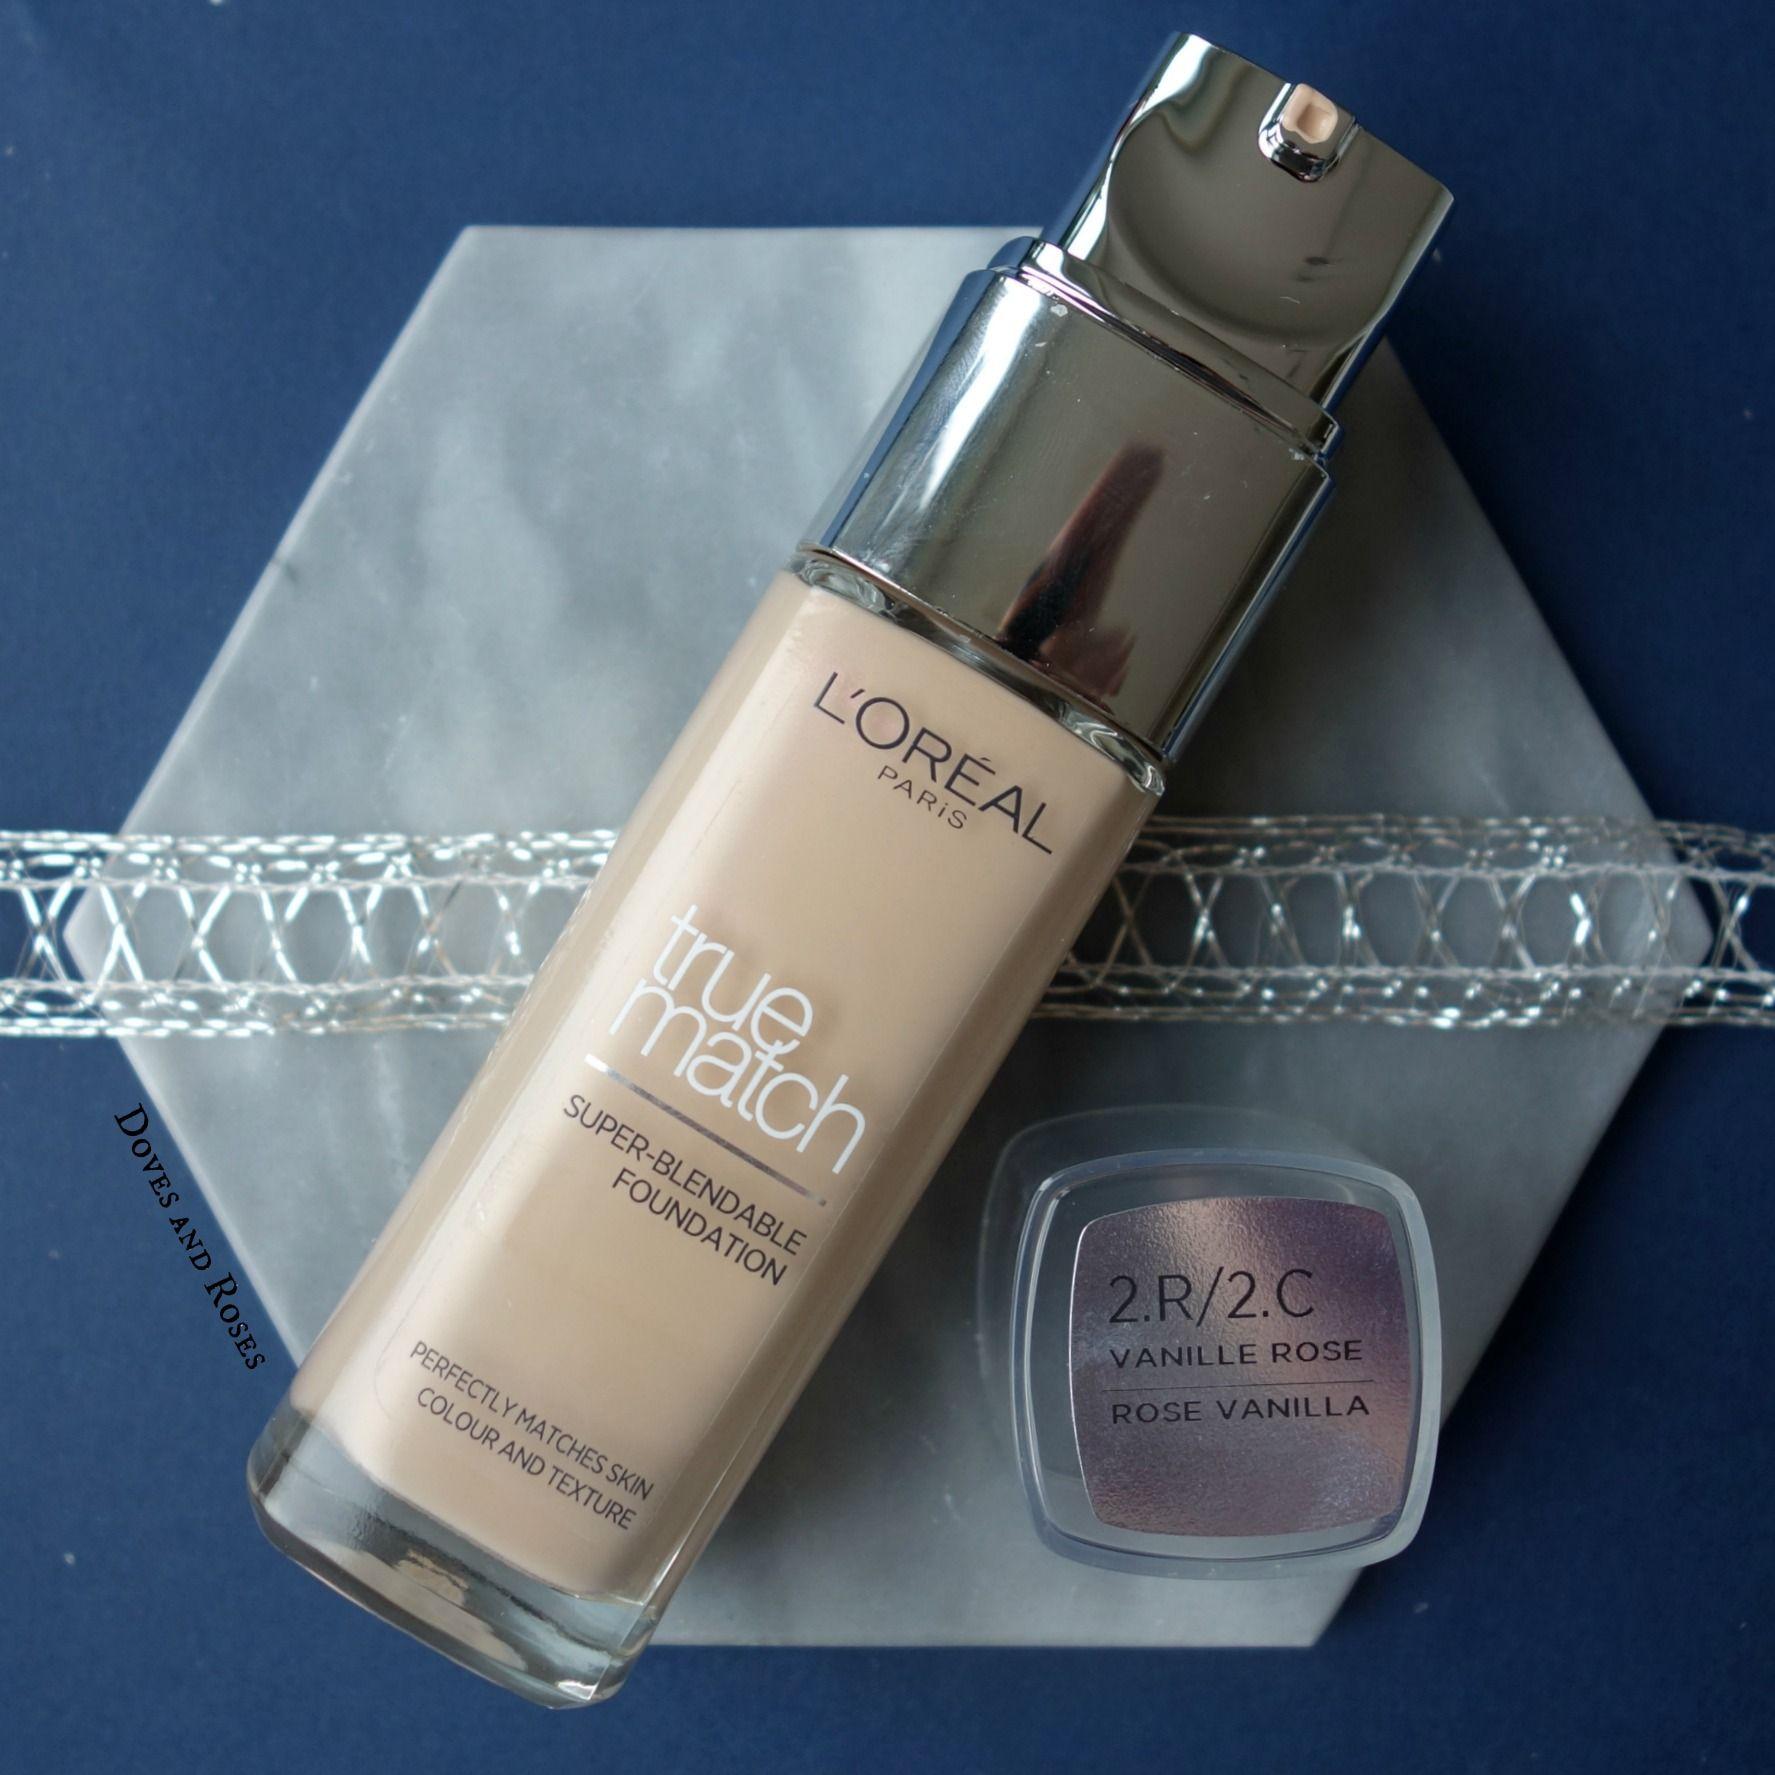 Loreal True Match Foundation in rose vanilla. Makeup